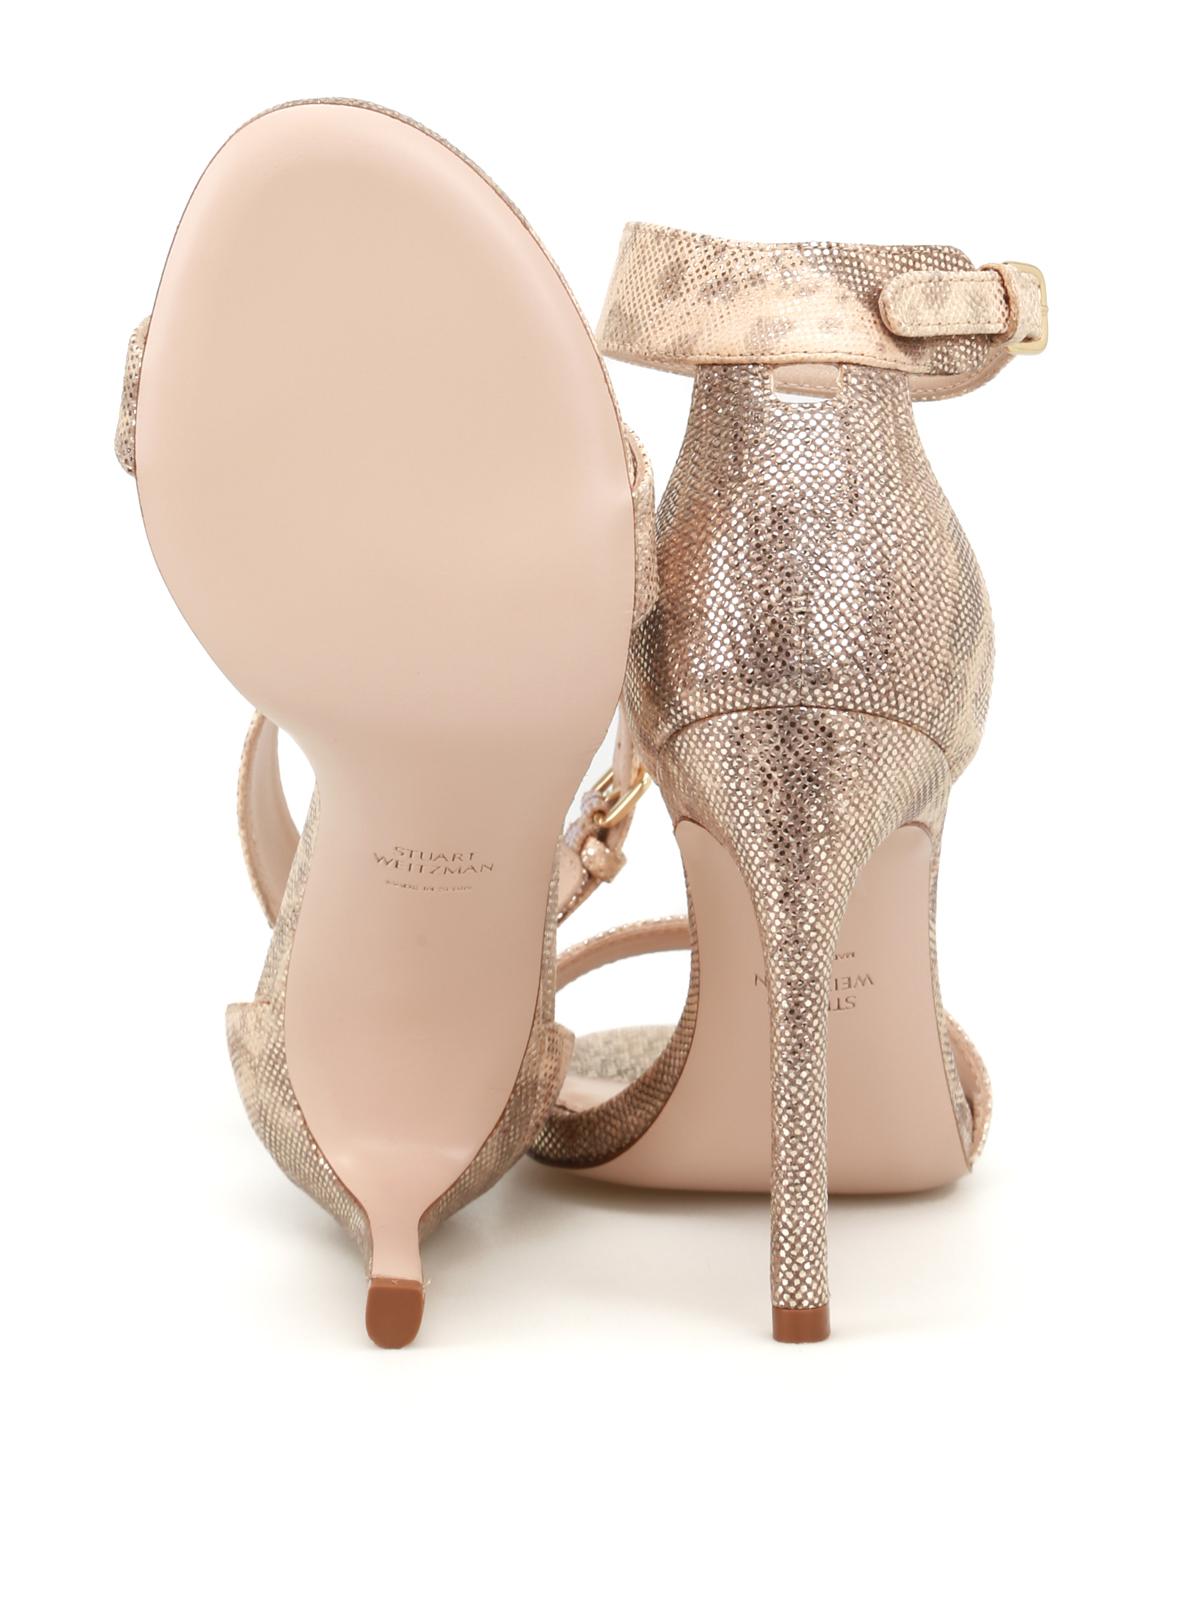 351ae41b2c5ed Stuart Weitzman - Backuptiz printed leather sandals - sandals ...